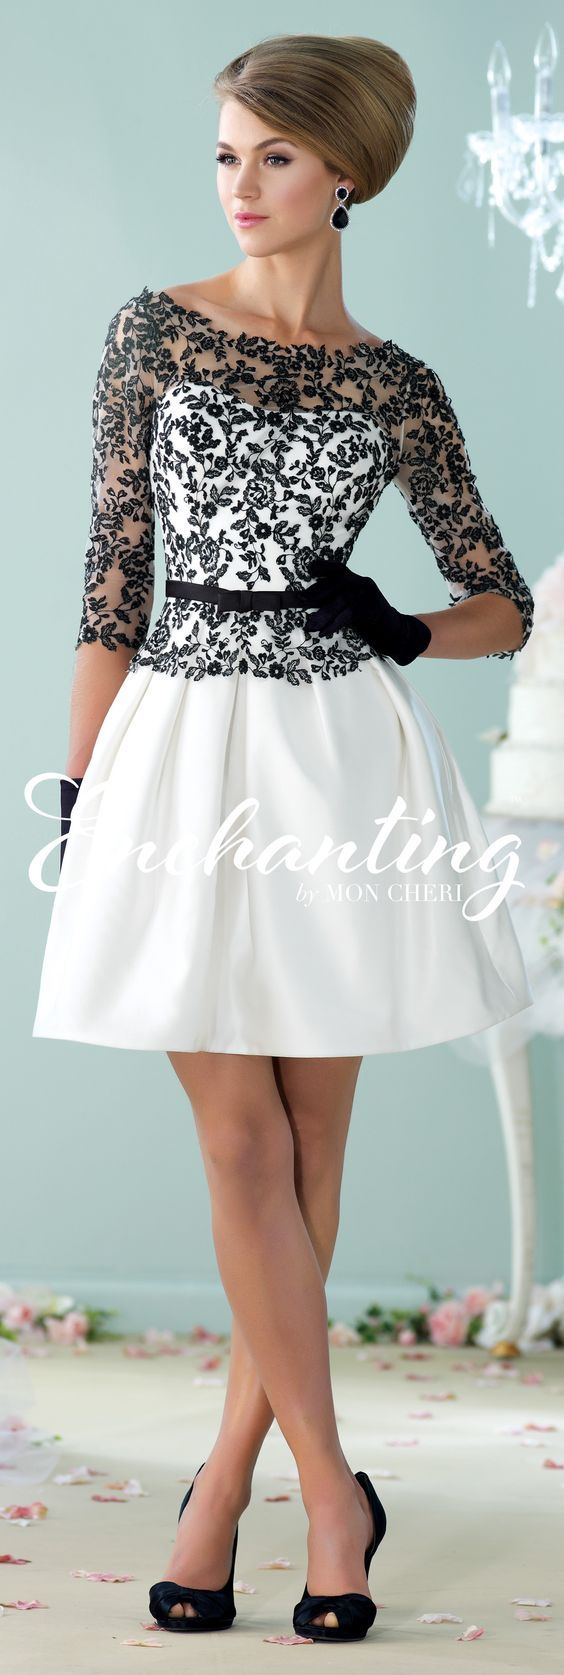 Enchanting by Mon Cheri - The Premiere Collection ~Style No. 215102 #shortweddingdress